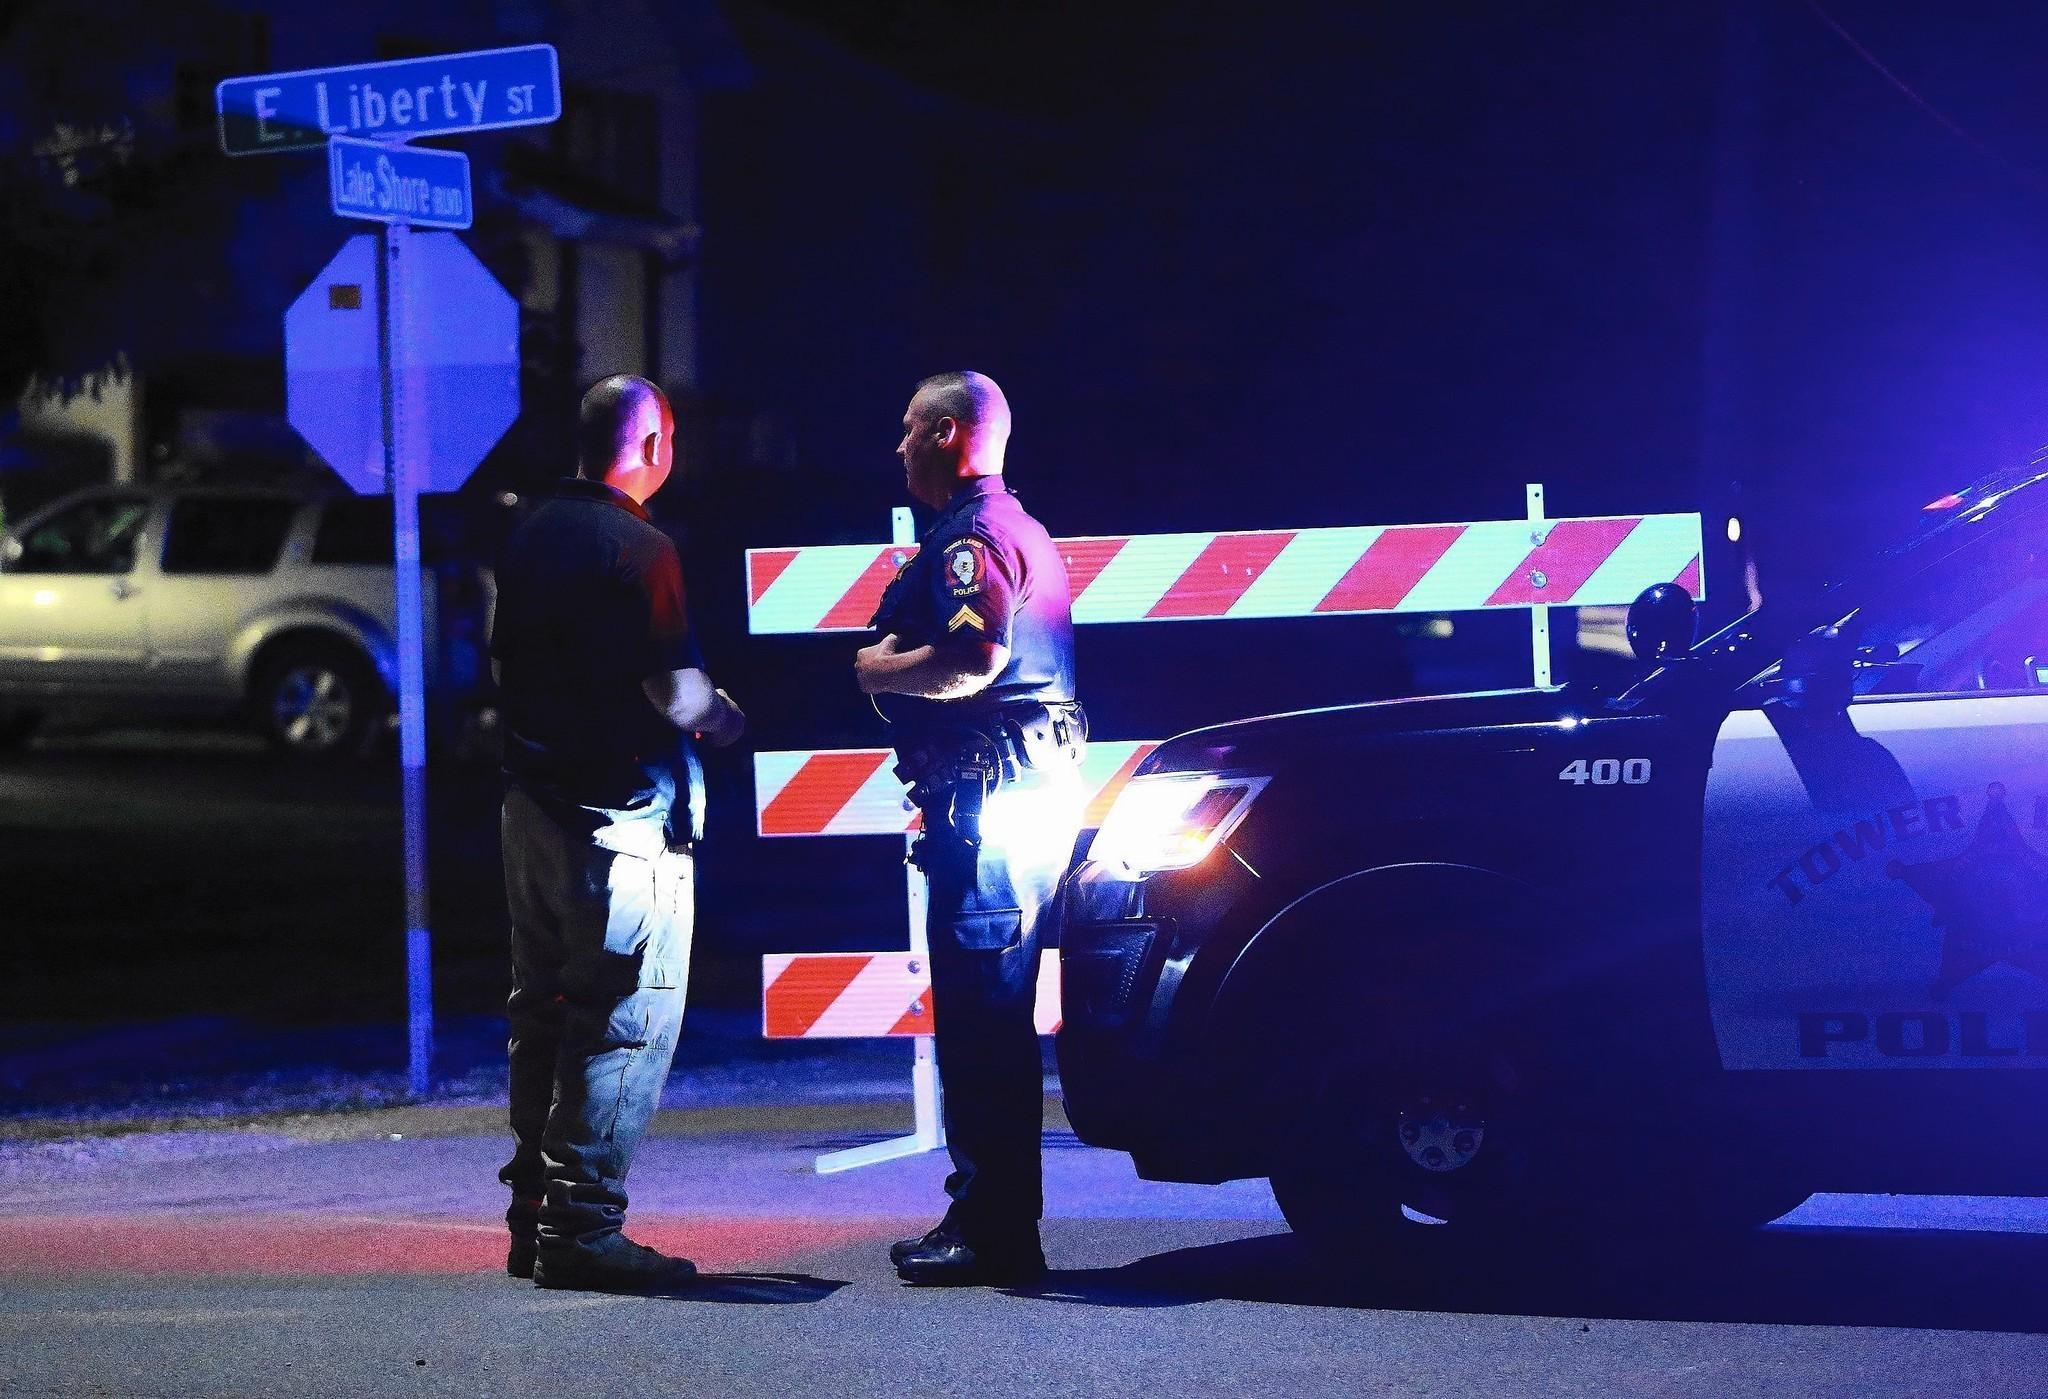 Illinois lake county wauconda - Police Wauconda Bomb Threat Suspect Had Illegal Explosive Devices In Home Lake County News Sun